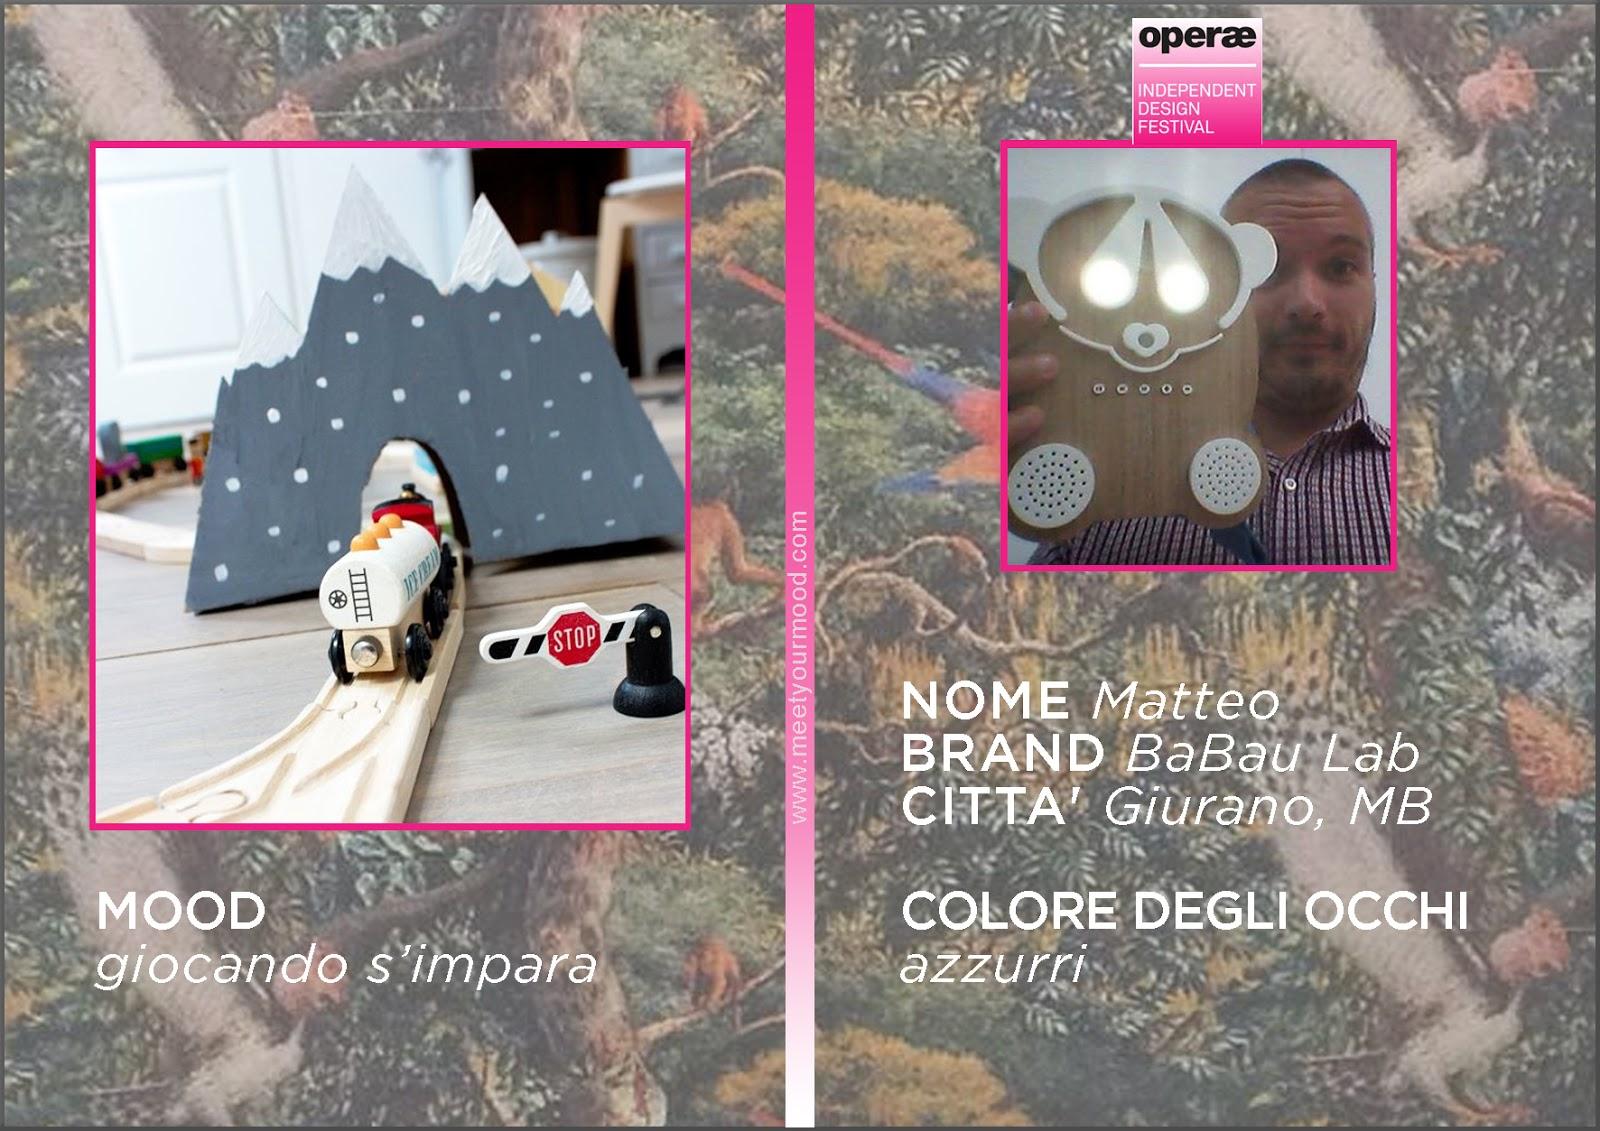 Myoperae l intervista ai designer indipendenti in mostra